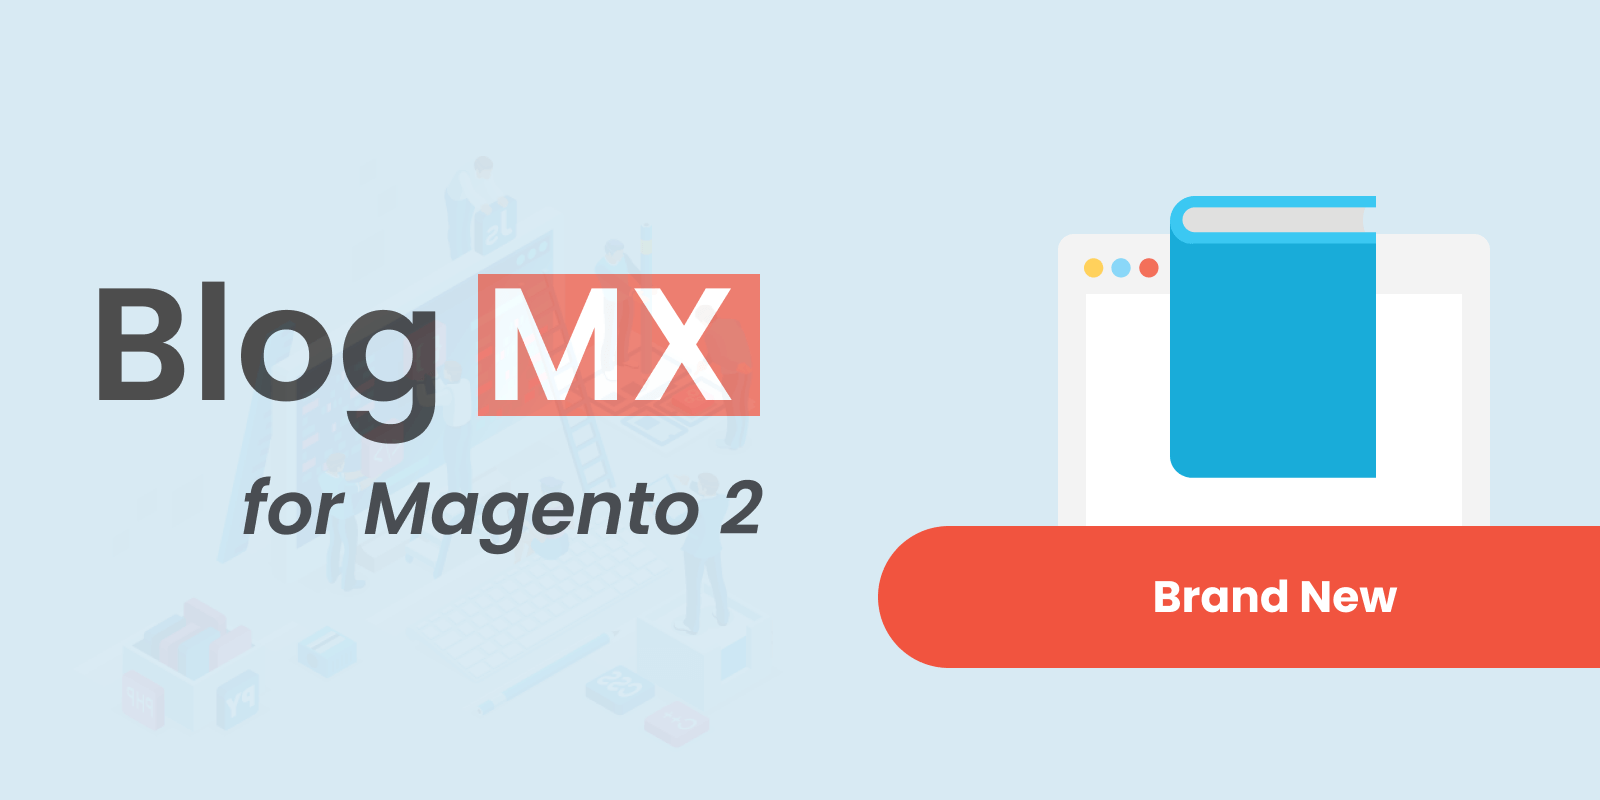 New Module: Magento 2 Blog MX